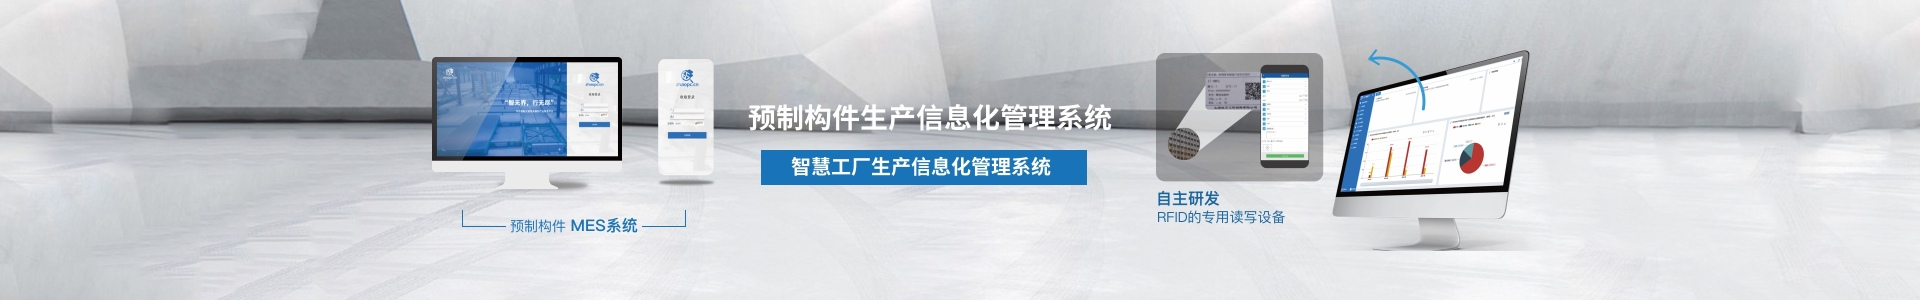 http://igreenbuy-zhaopc-public.oss-cn-shanghai.aliyuncs.com/common/20200618/cbfc19fbdea2b05f1b6dc6d66a3d2f86151514.jpg